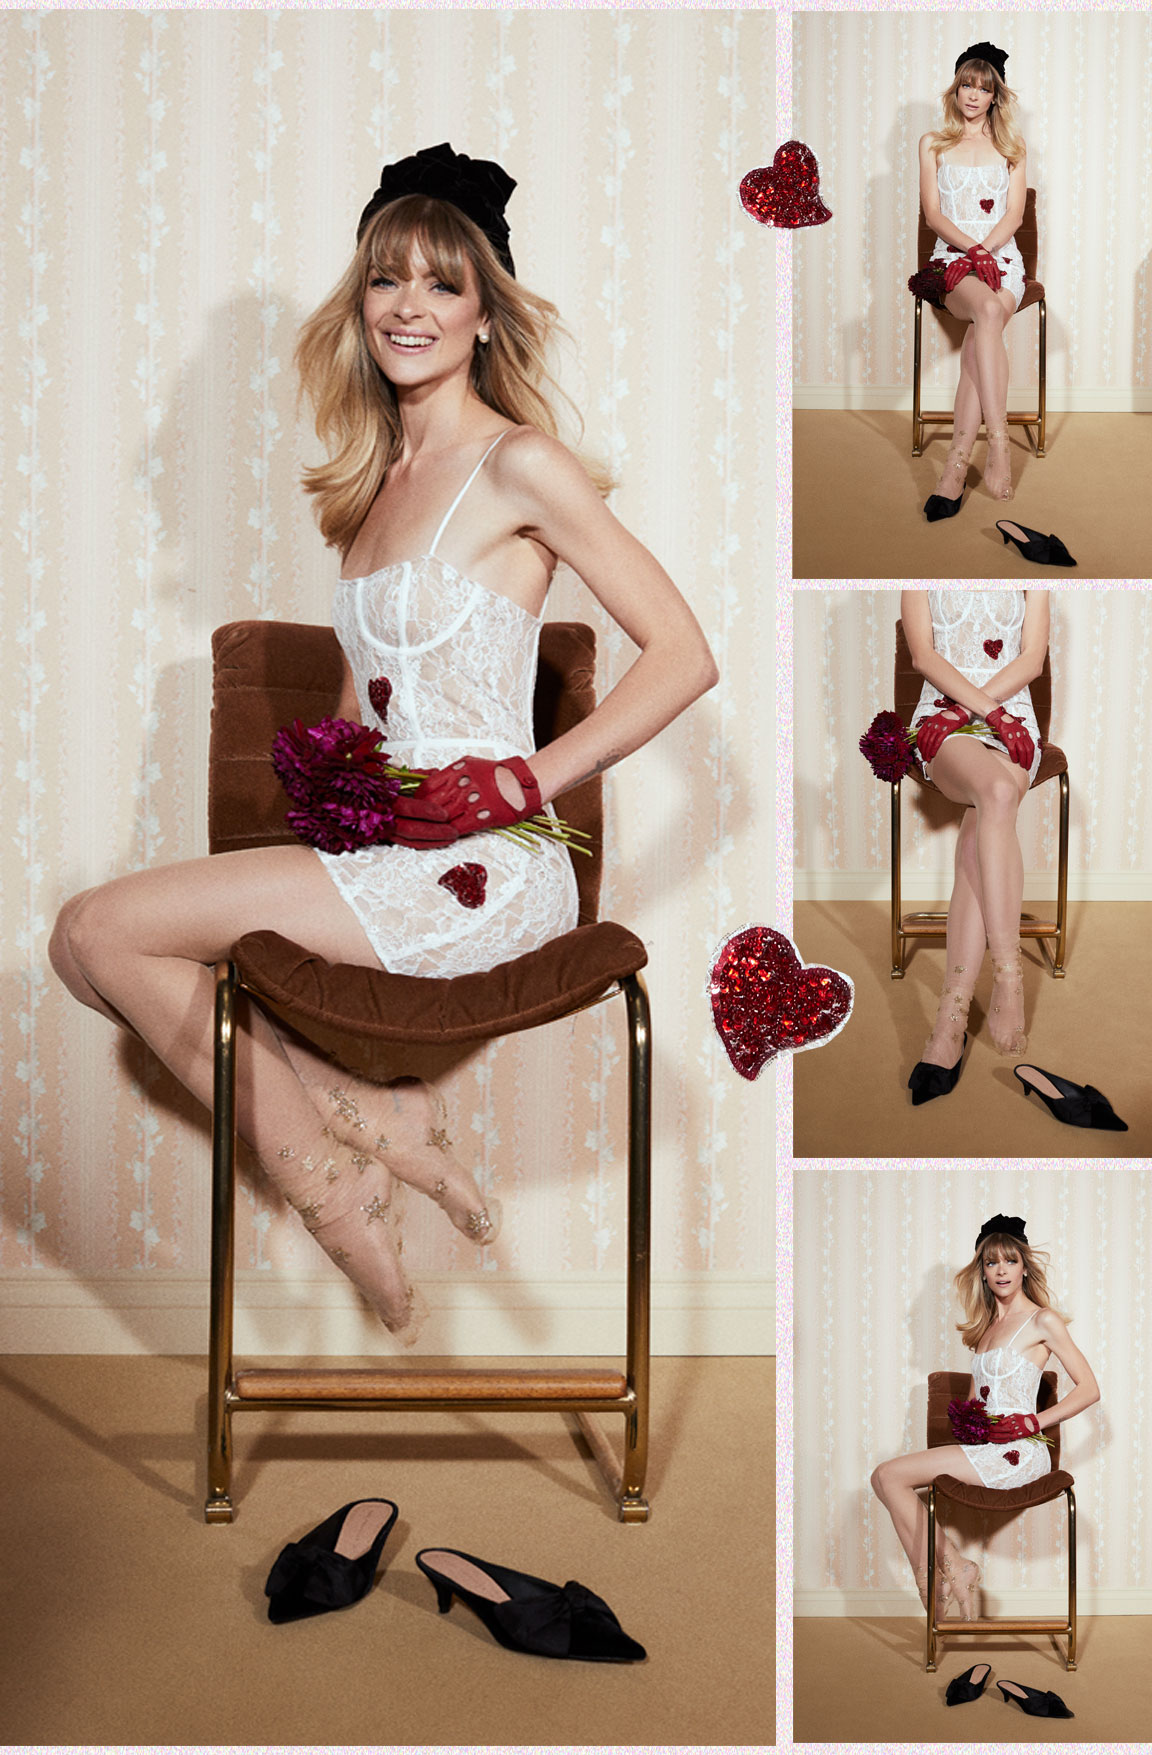 La Christy Mini Dress